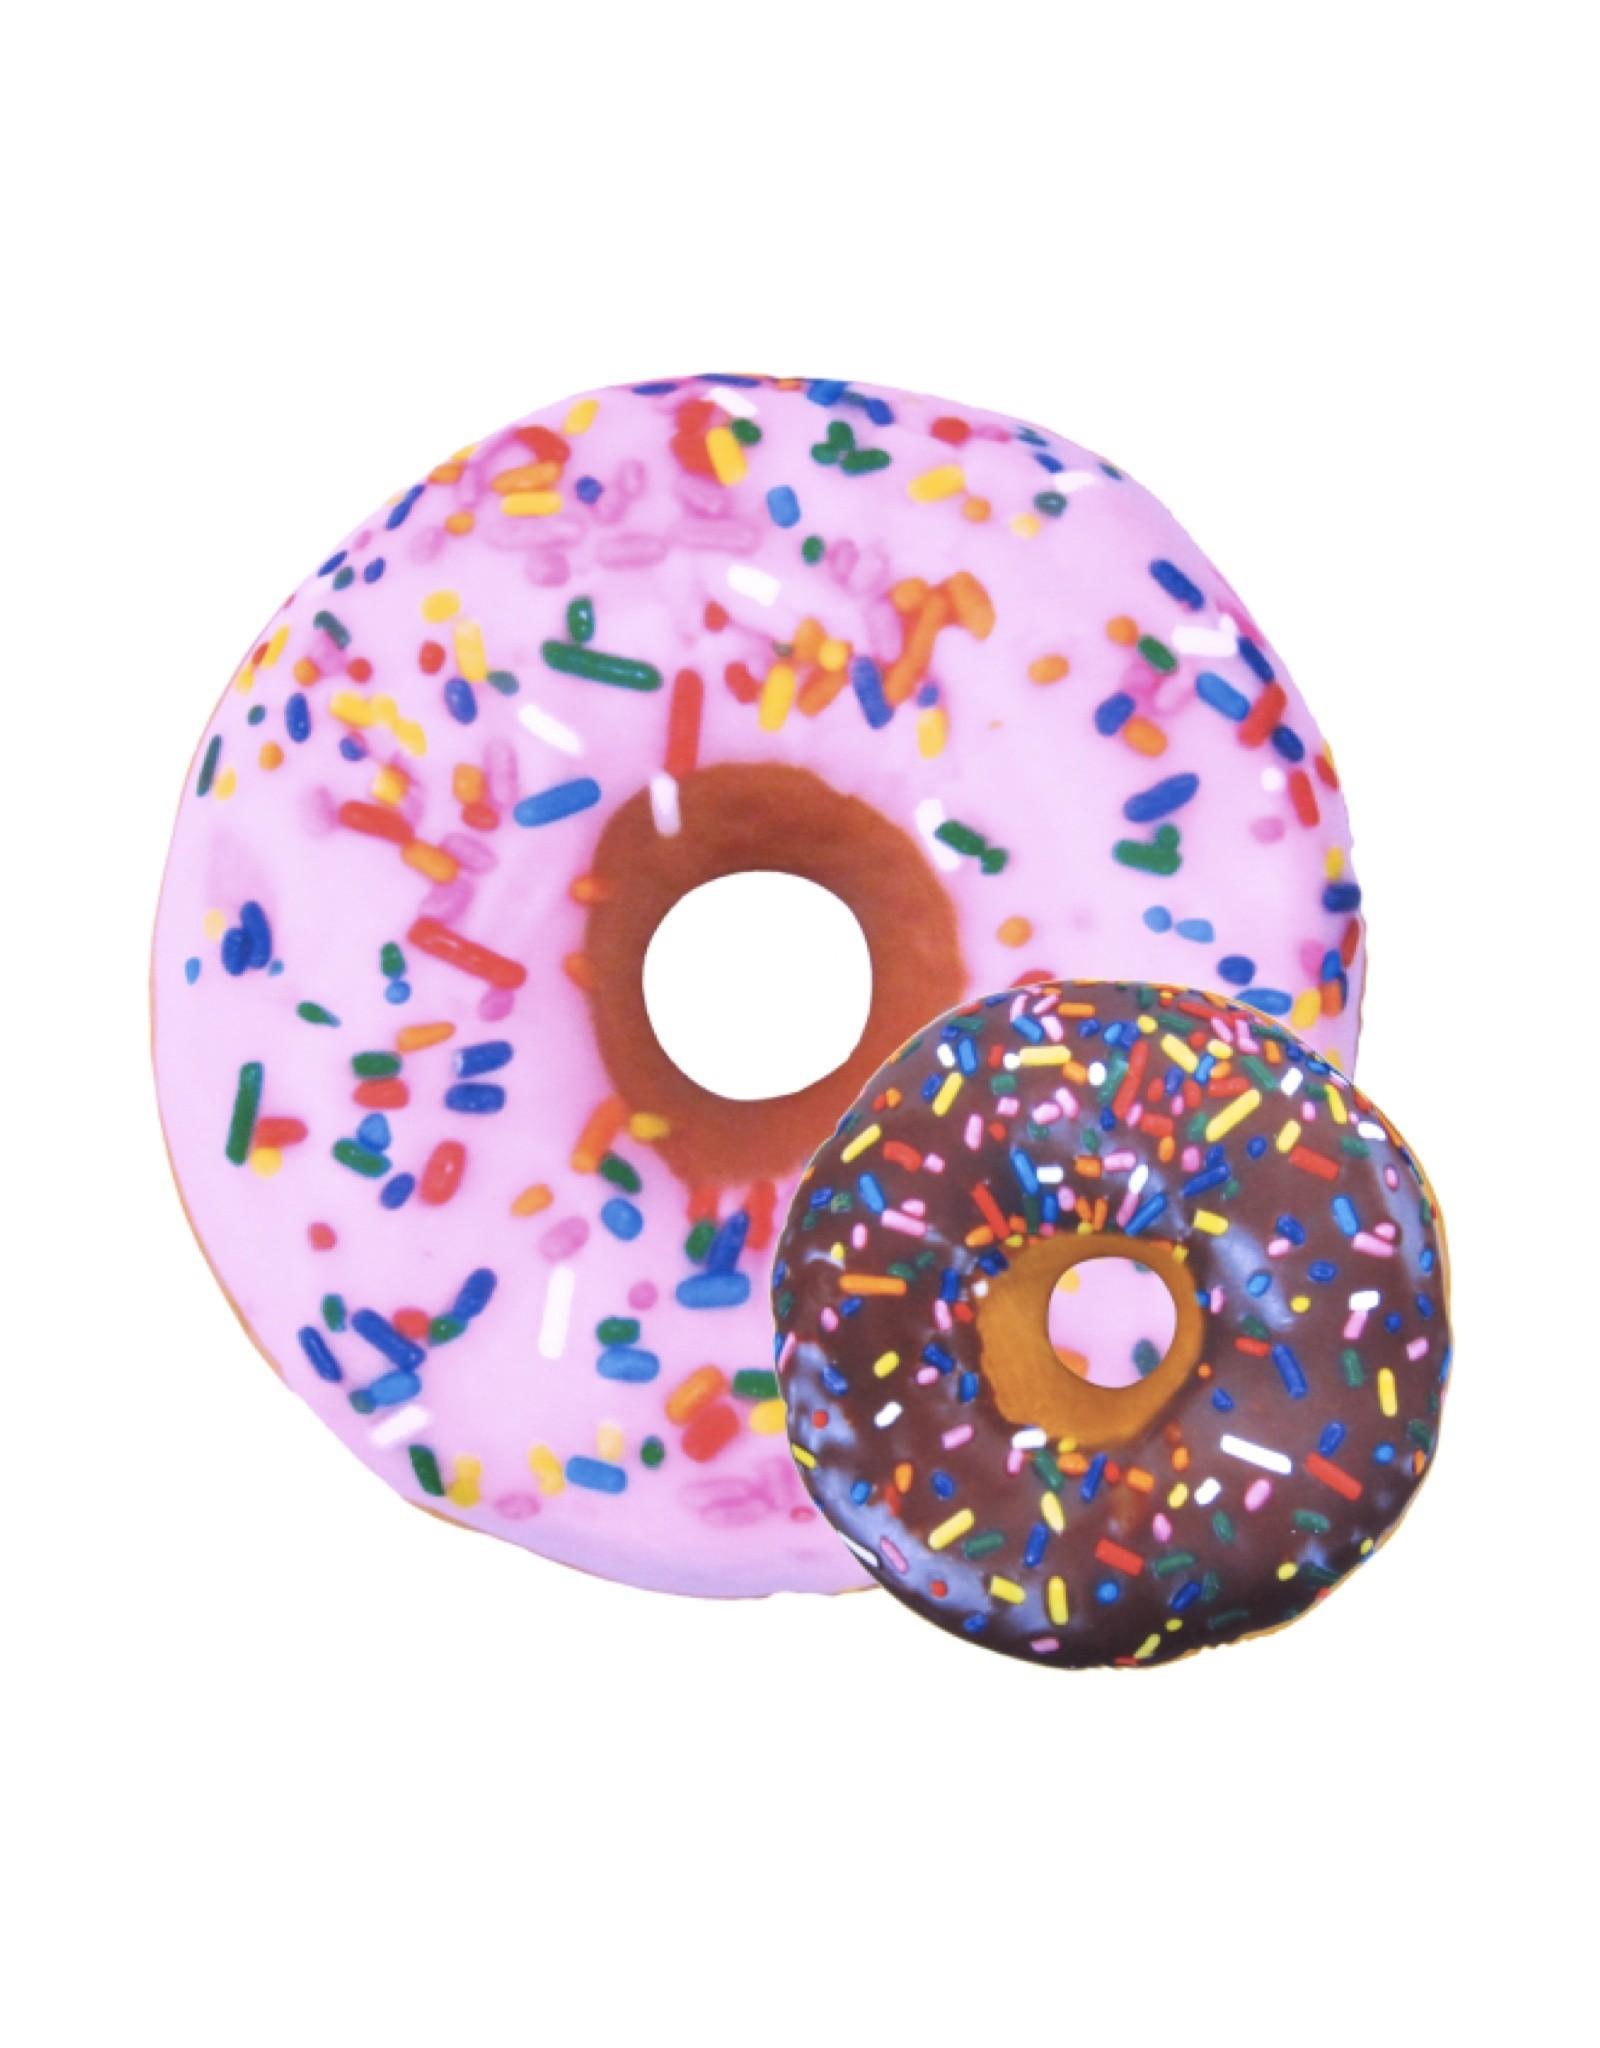 Iscream Donut Pillow